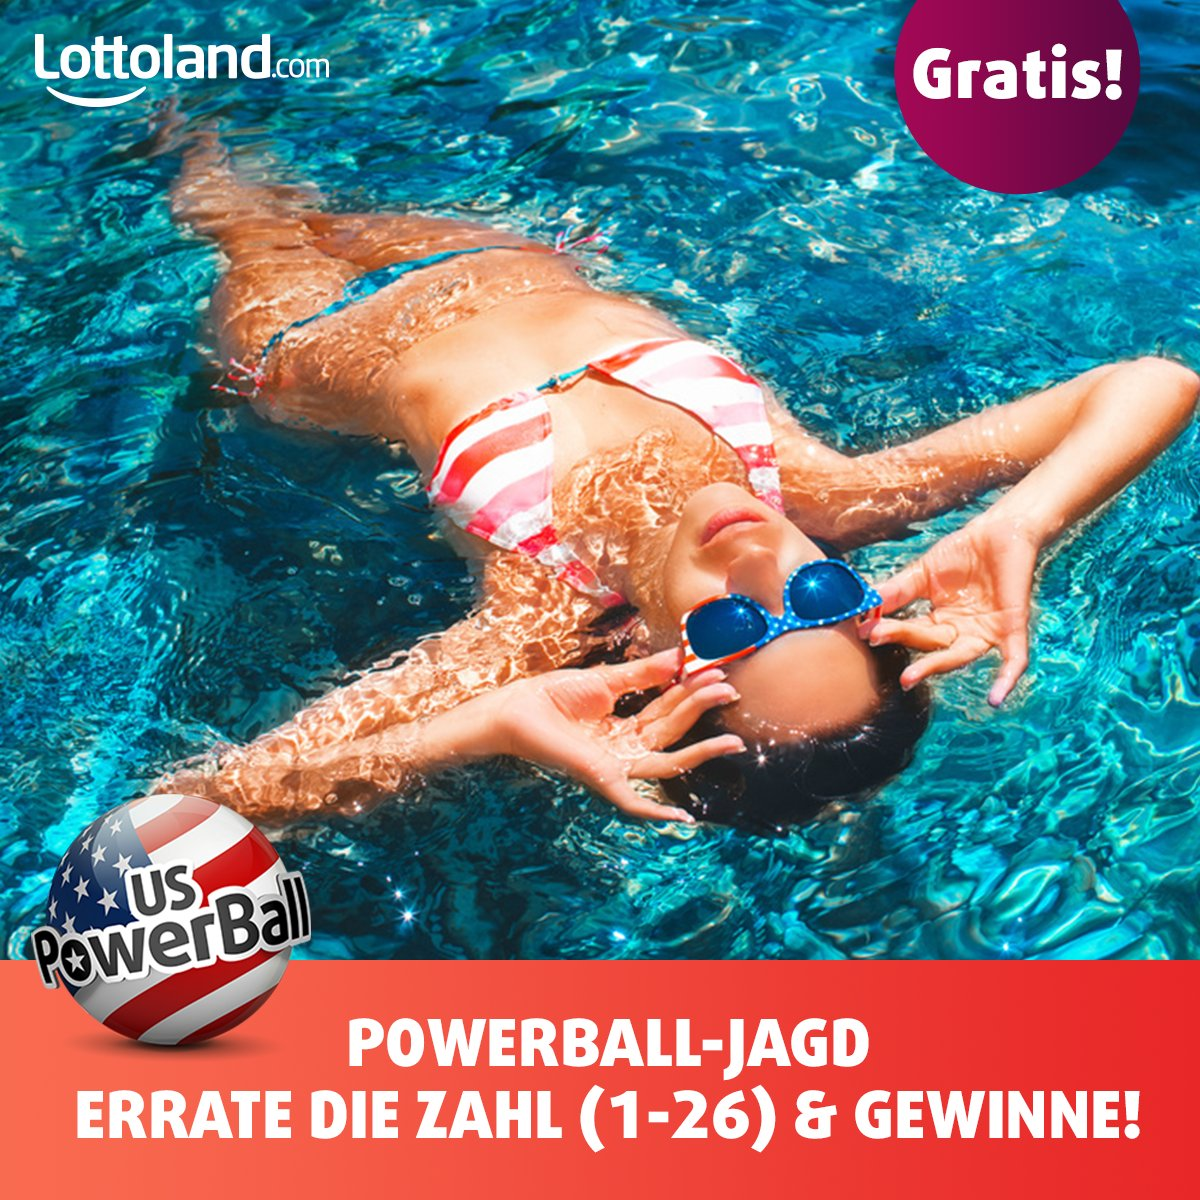 www lottoland com